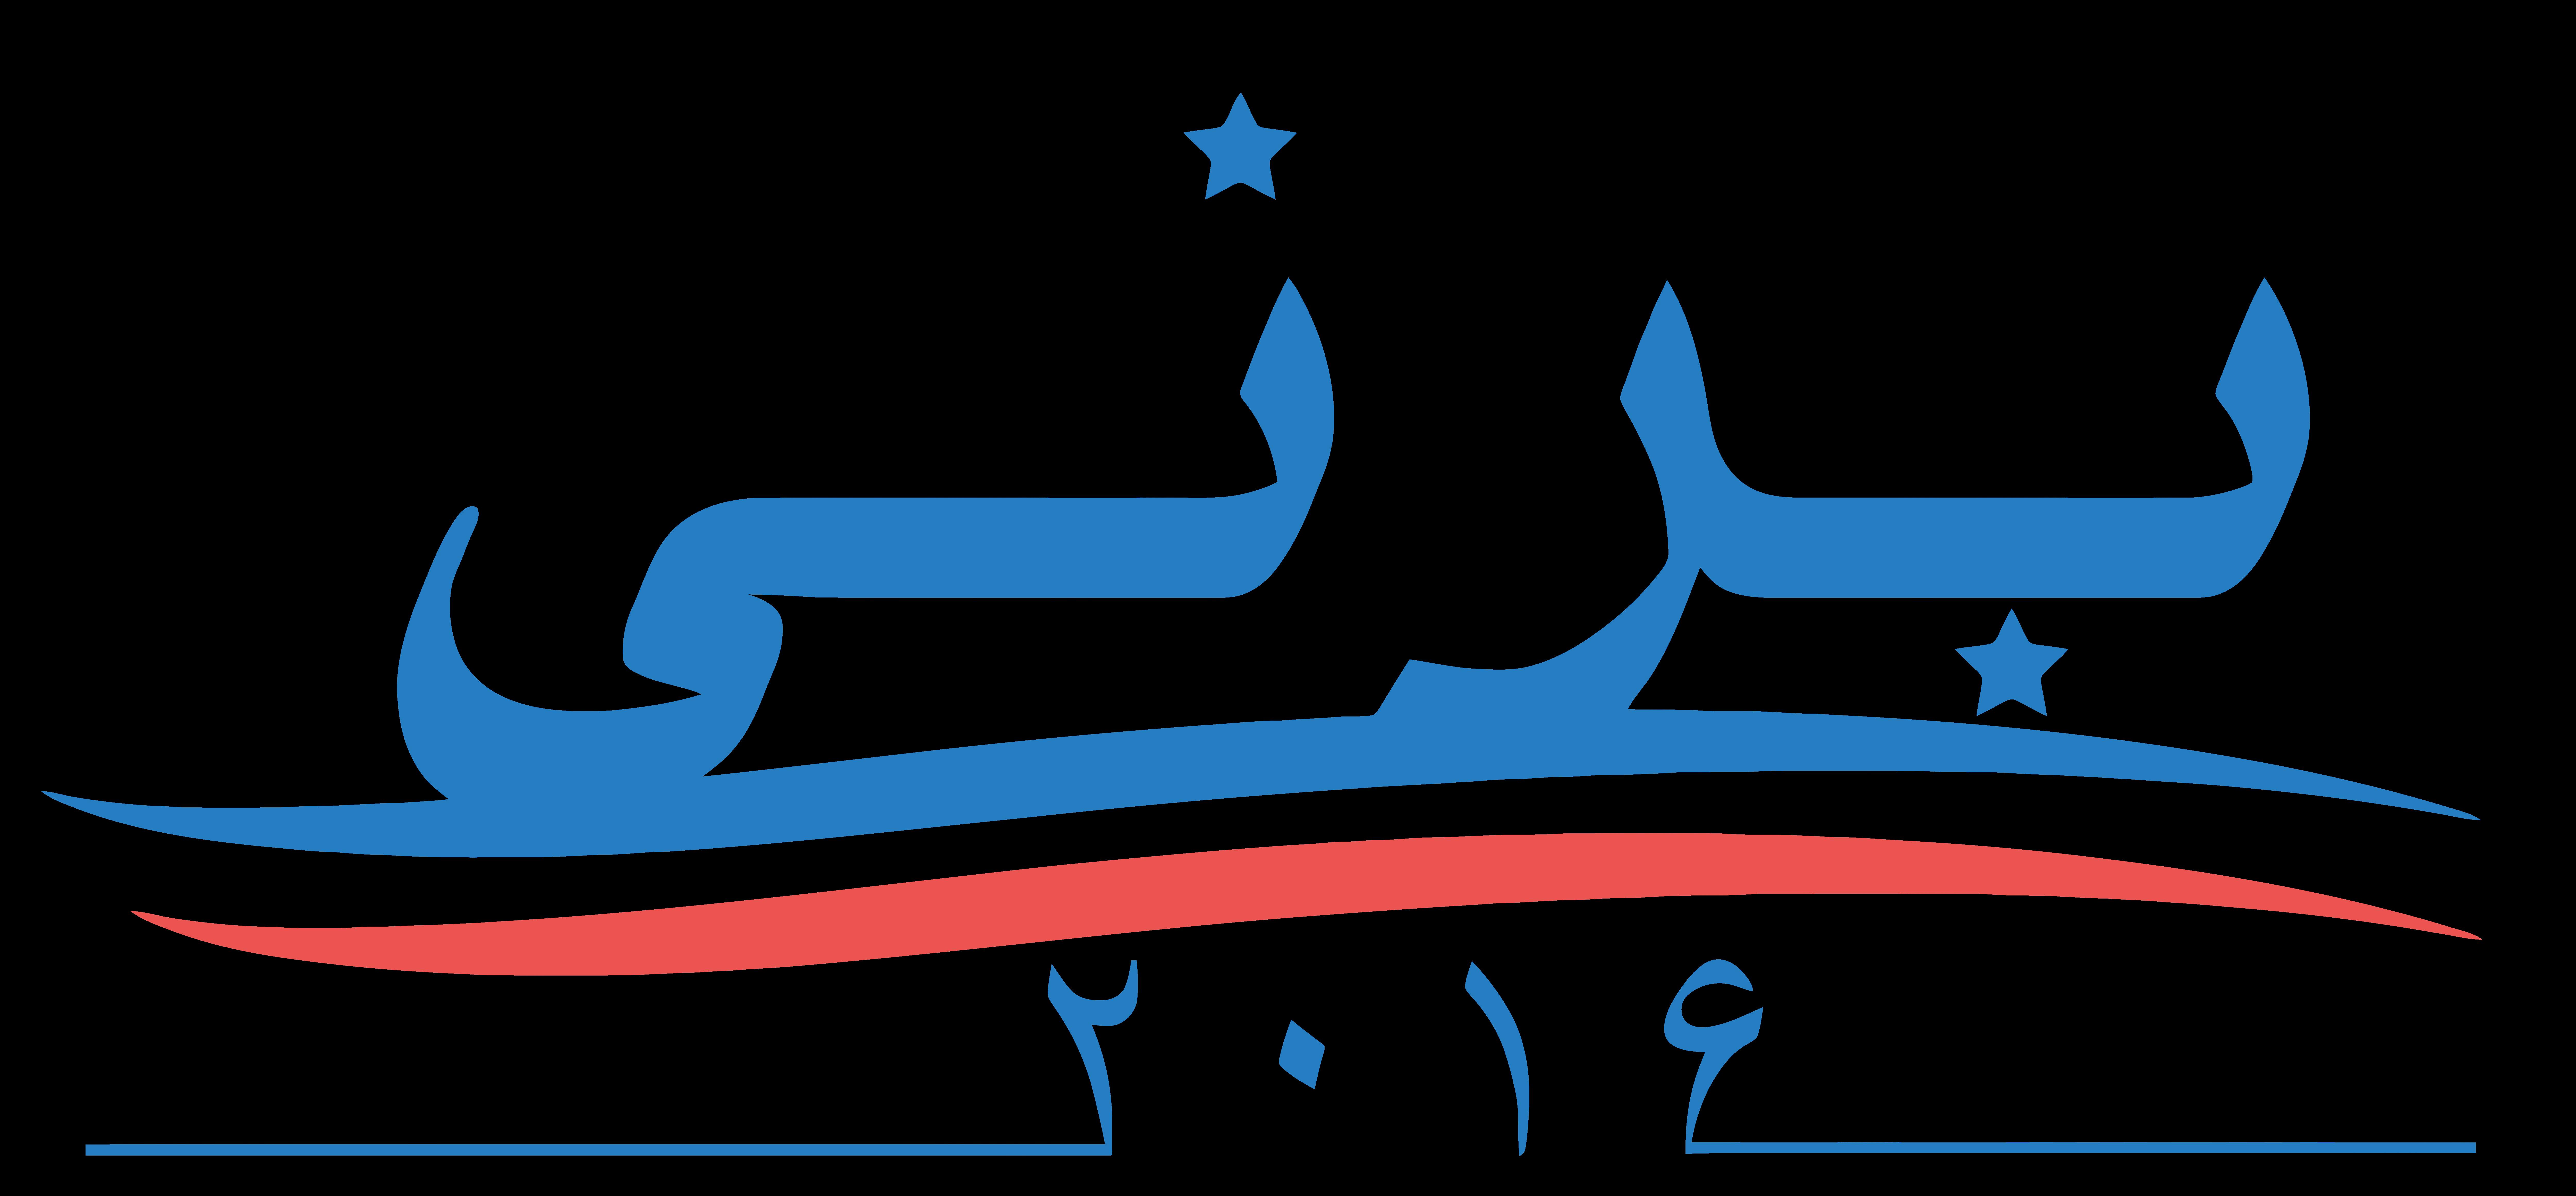 File:Bernie Sanders presidential campaign logo in Persian.png.